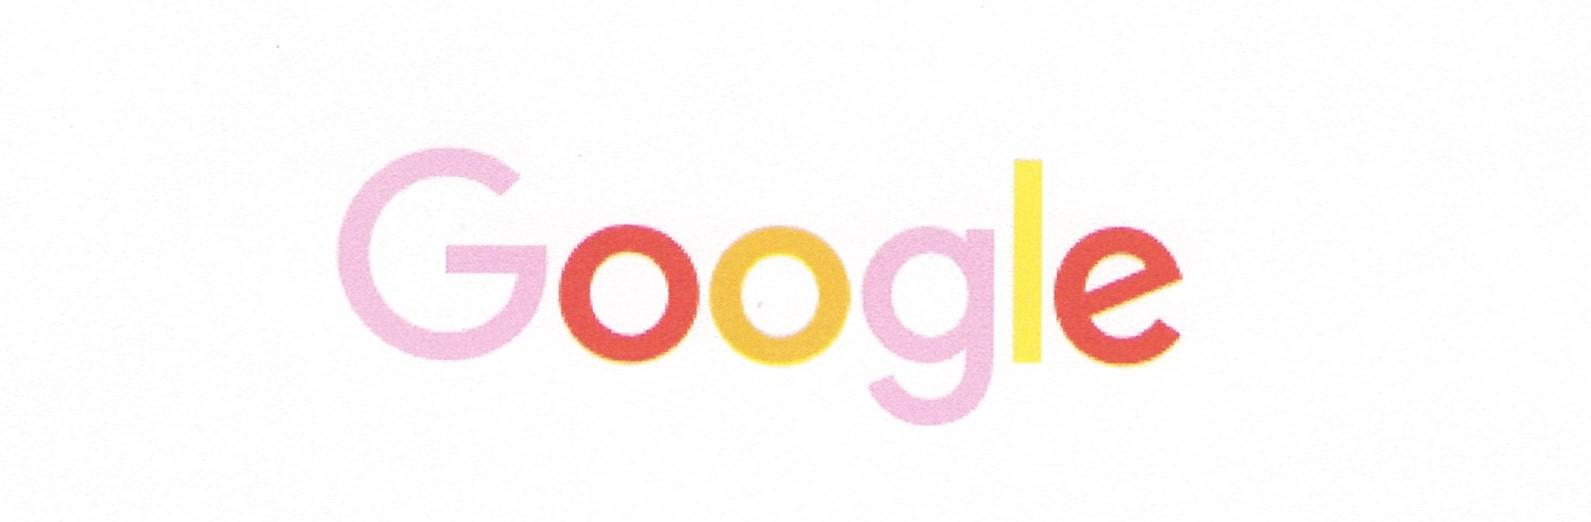 google-logo-print.jpg